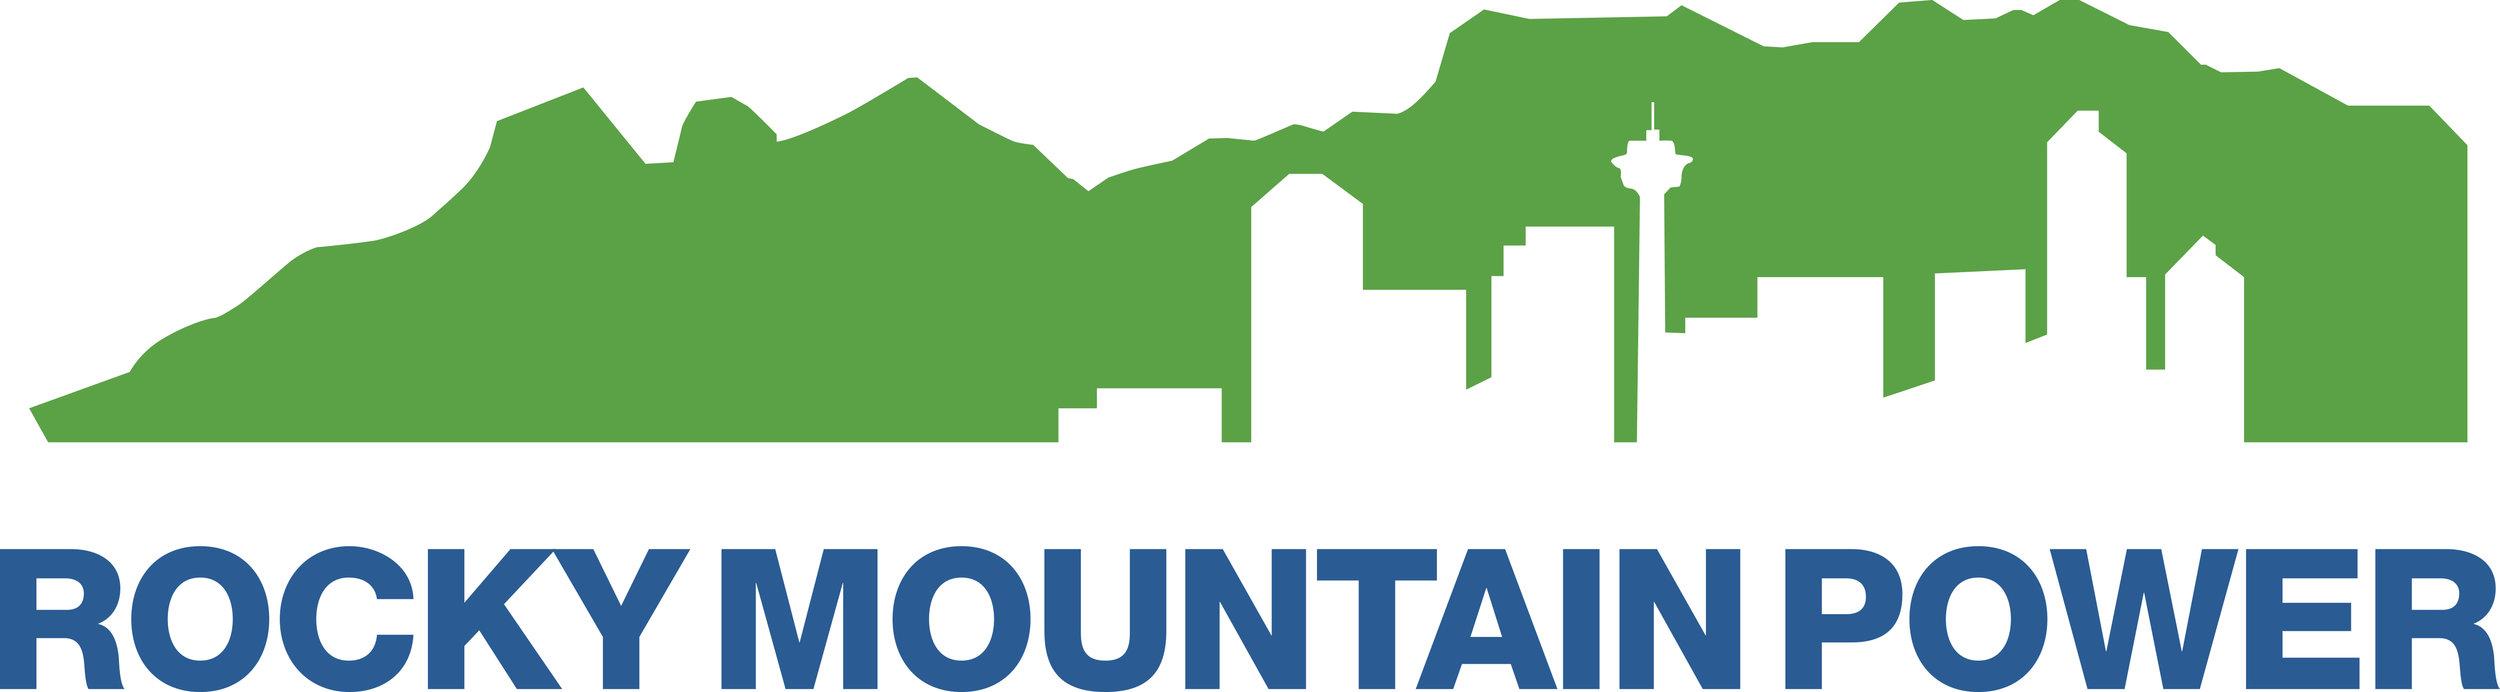 Rocky Mountain Power hi res logo.jpg